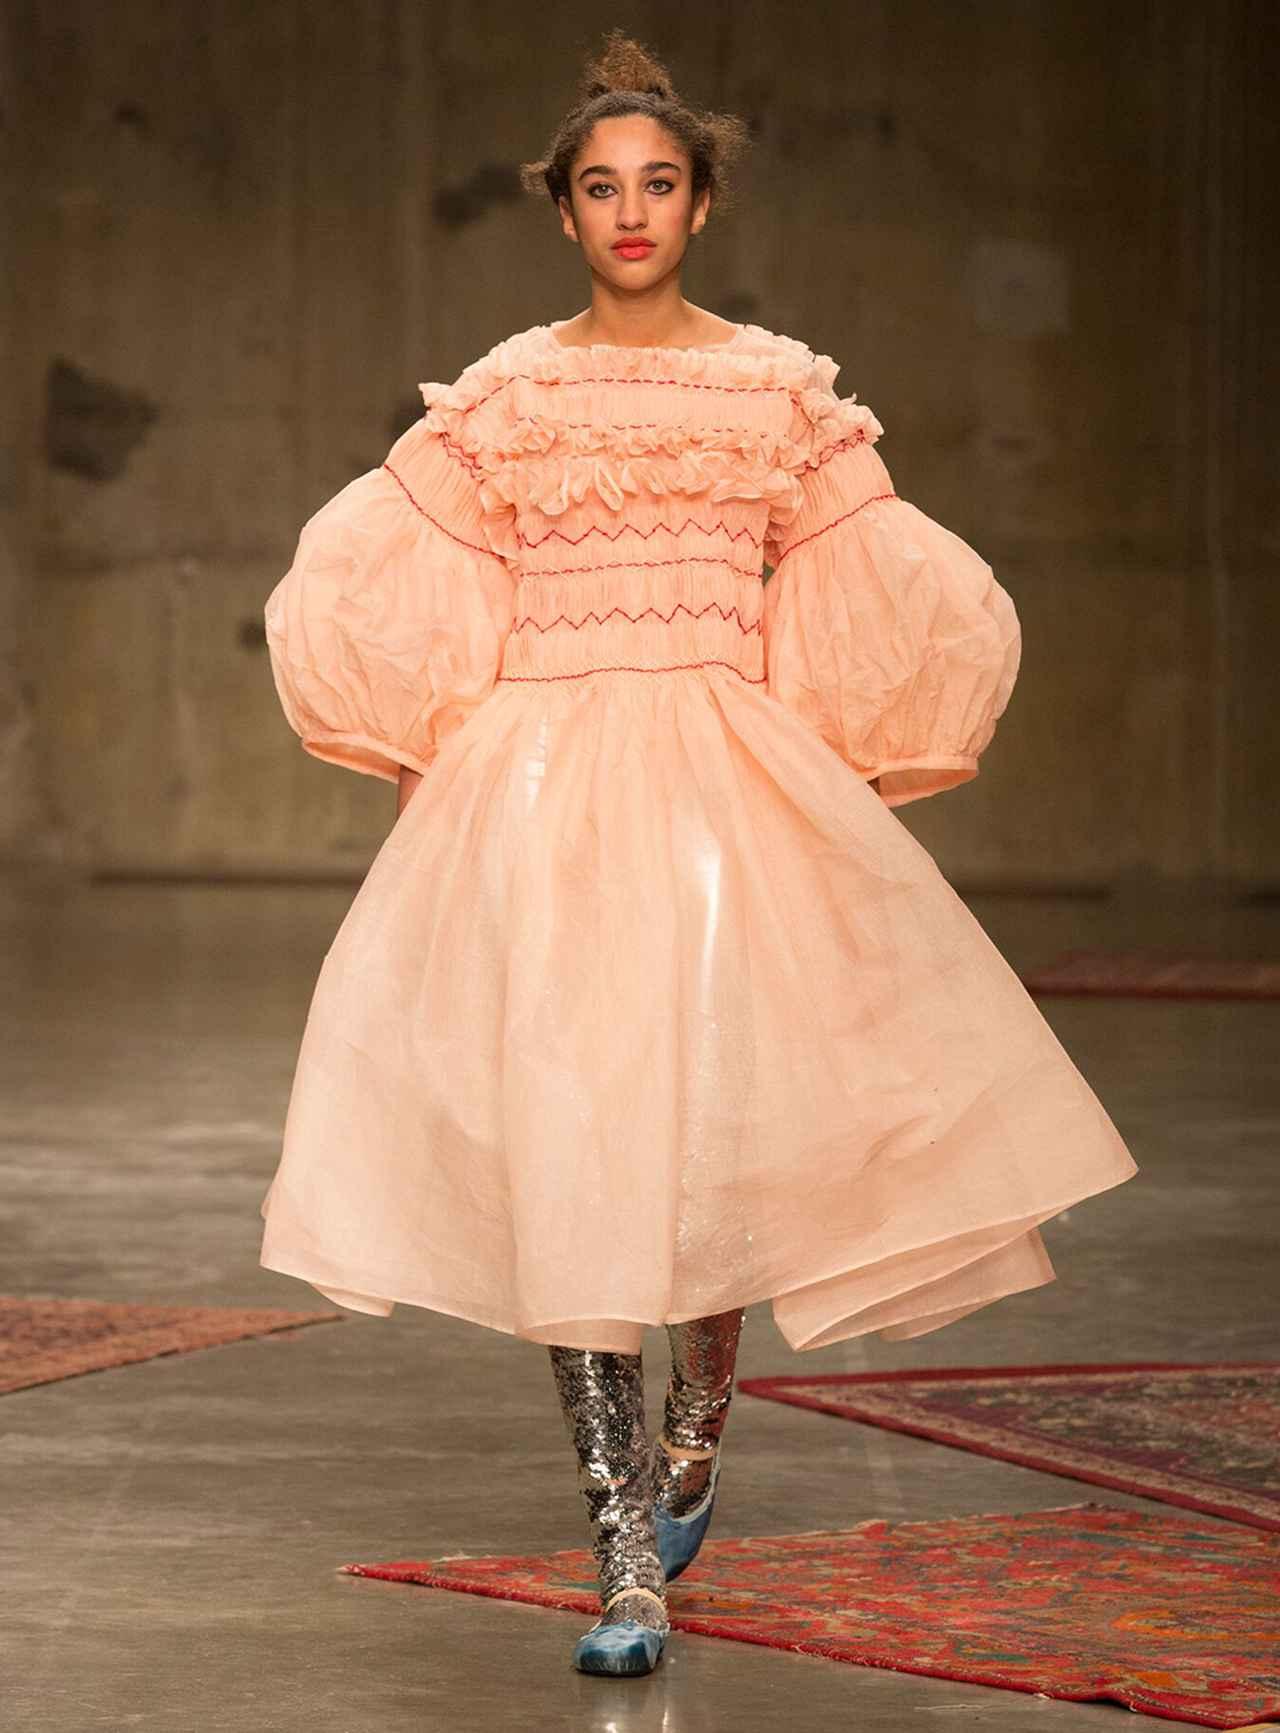 Images : 1番目の画像 - 「ドレス自由自在<Vol.2> 新しい才能が花盛り。 ニュー・ドレス時代到来」のアルバム - T JAPAN:The New York Times Style Magazine 公式サイト